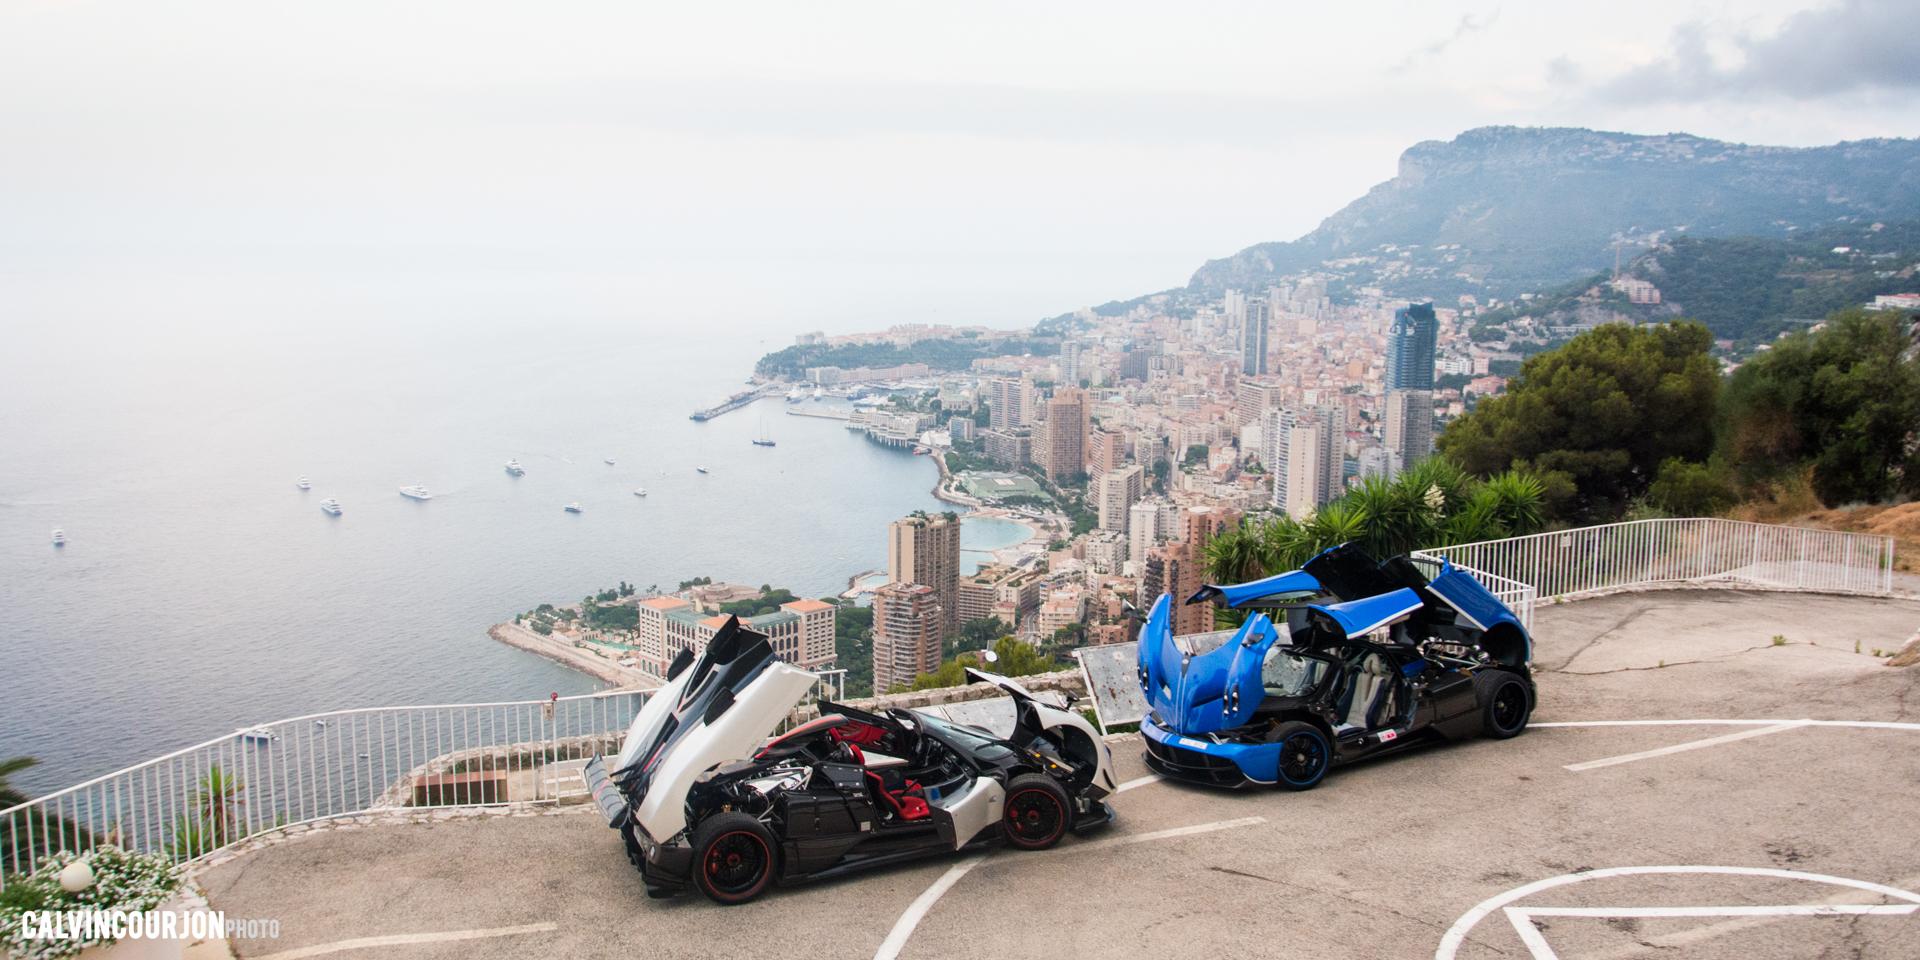 Pagani Zonda Cinque Roadster et Pagani Huayra - EPIC pose - panorama - Cote dAzur - 2015 - Calvin Courjon